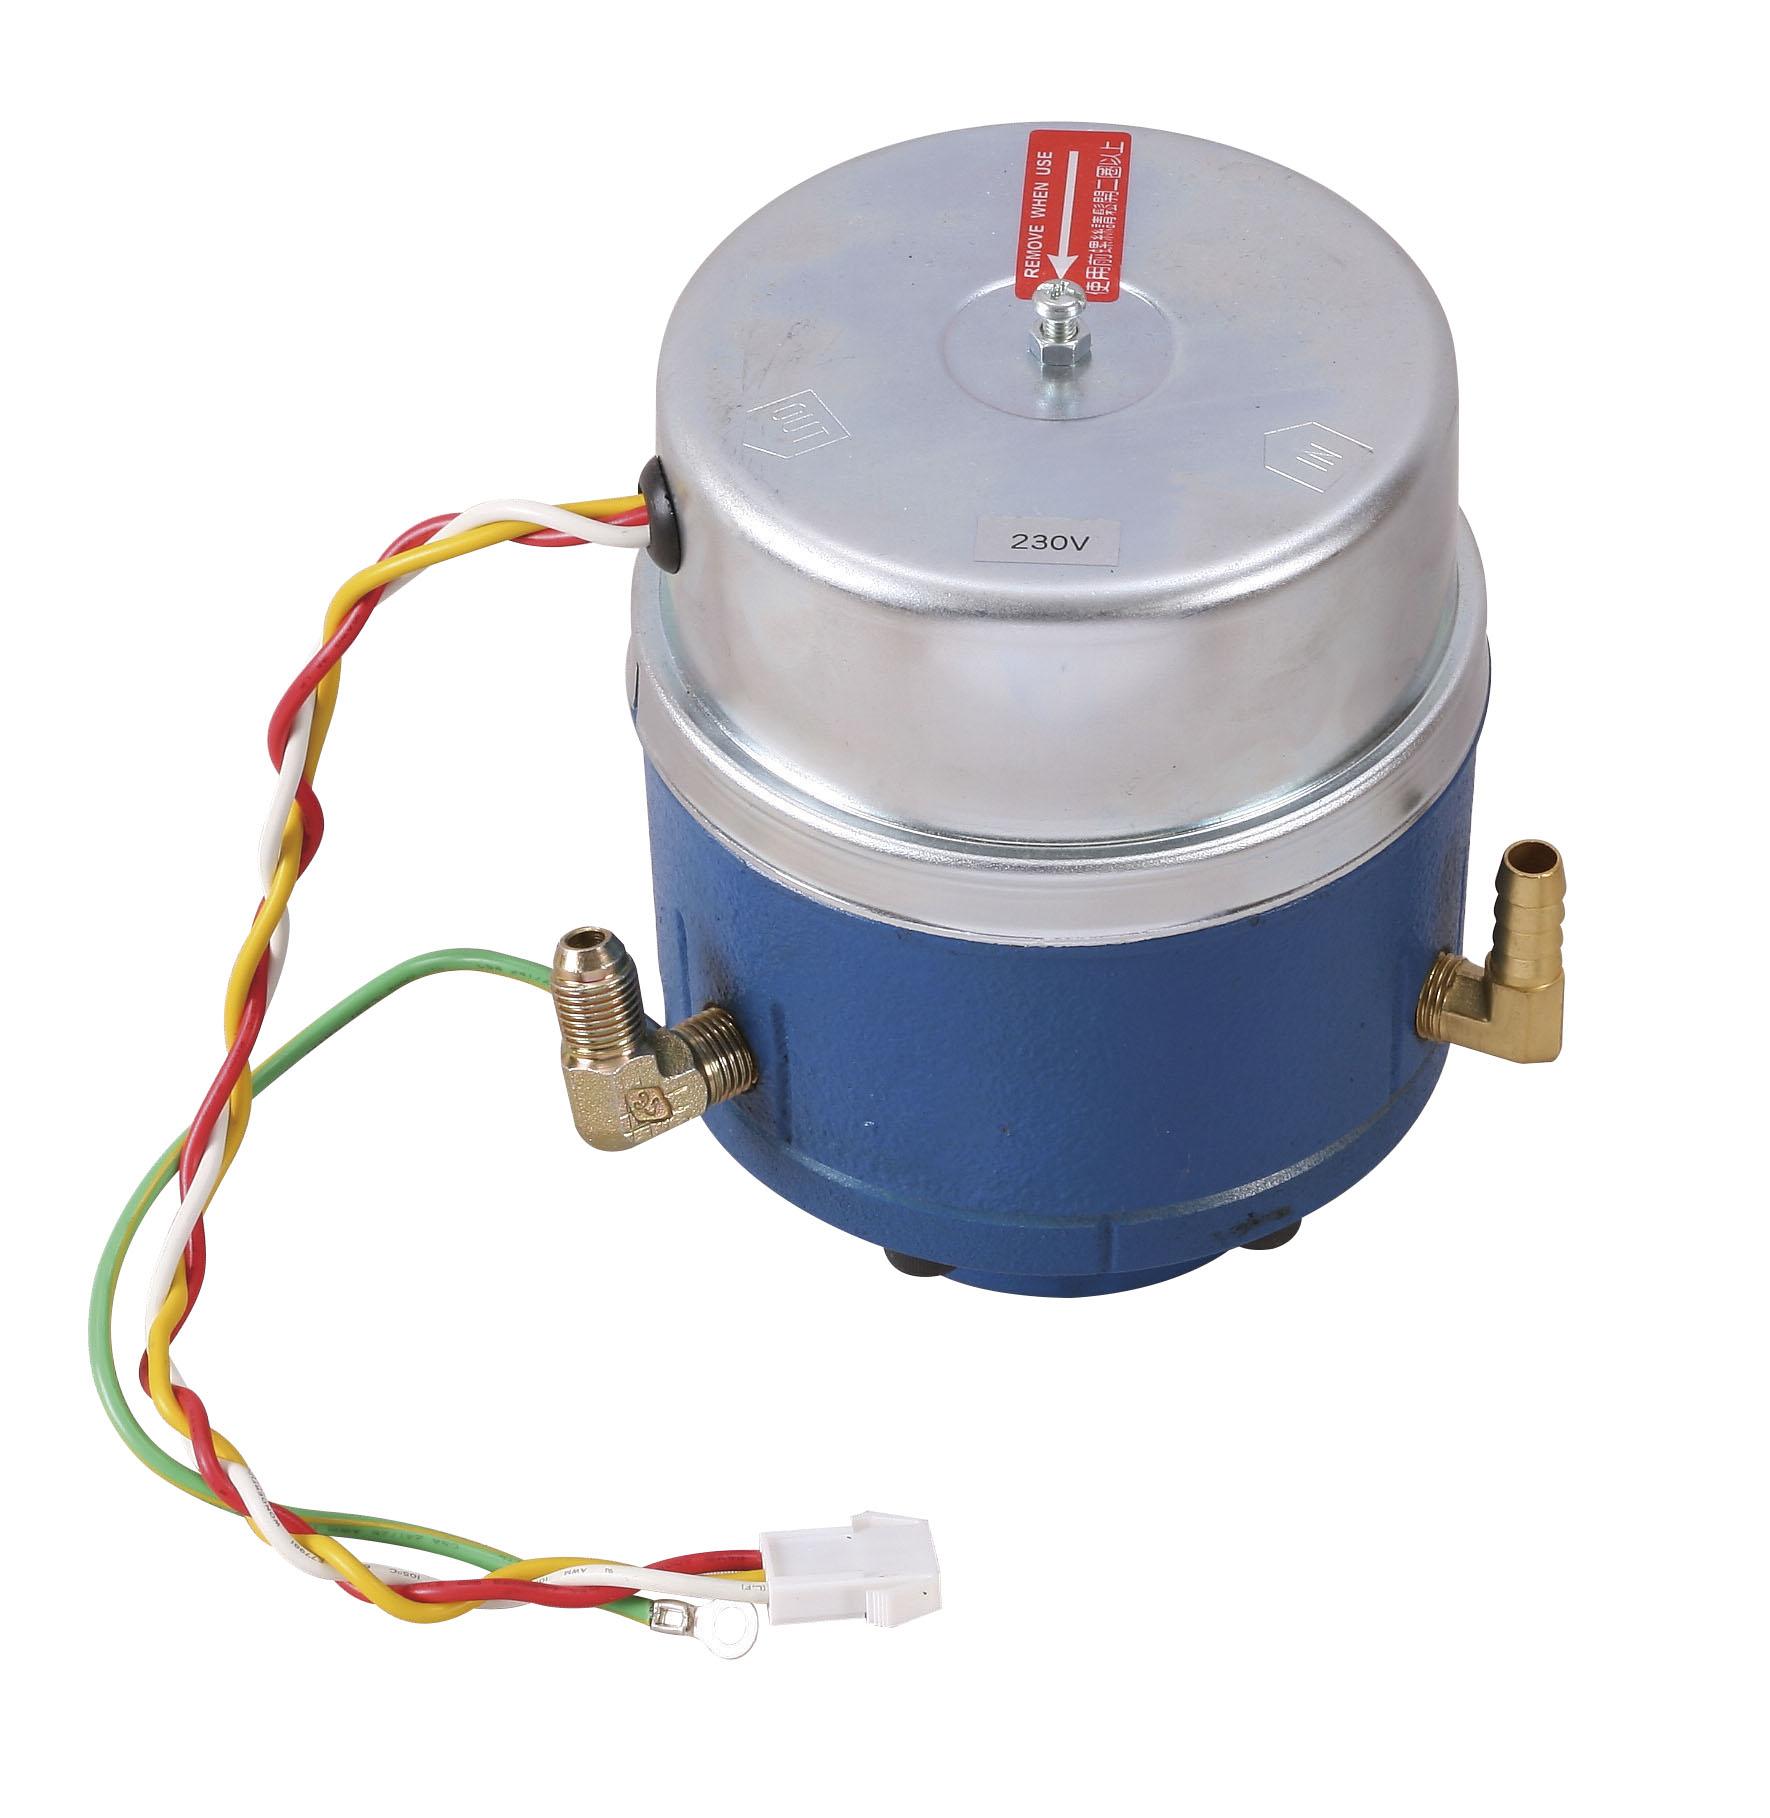 110V油壓馬達 Image